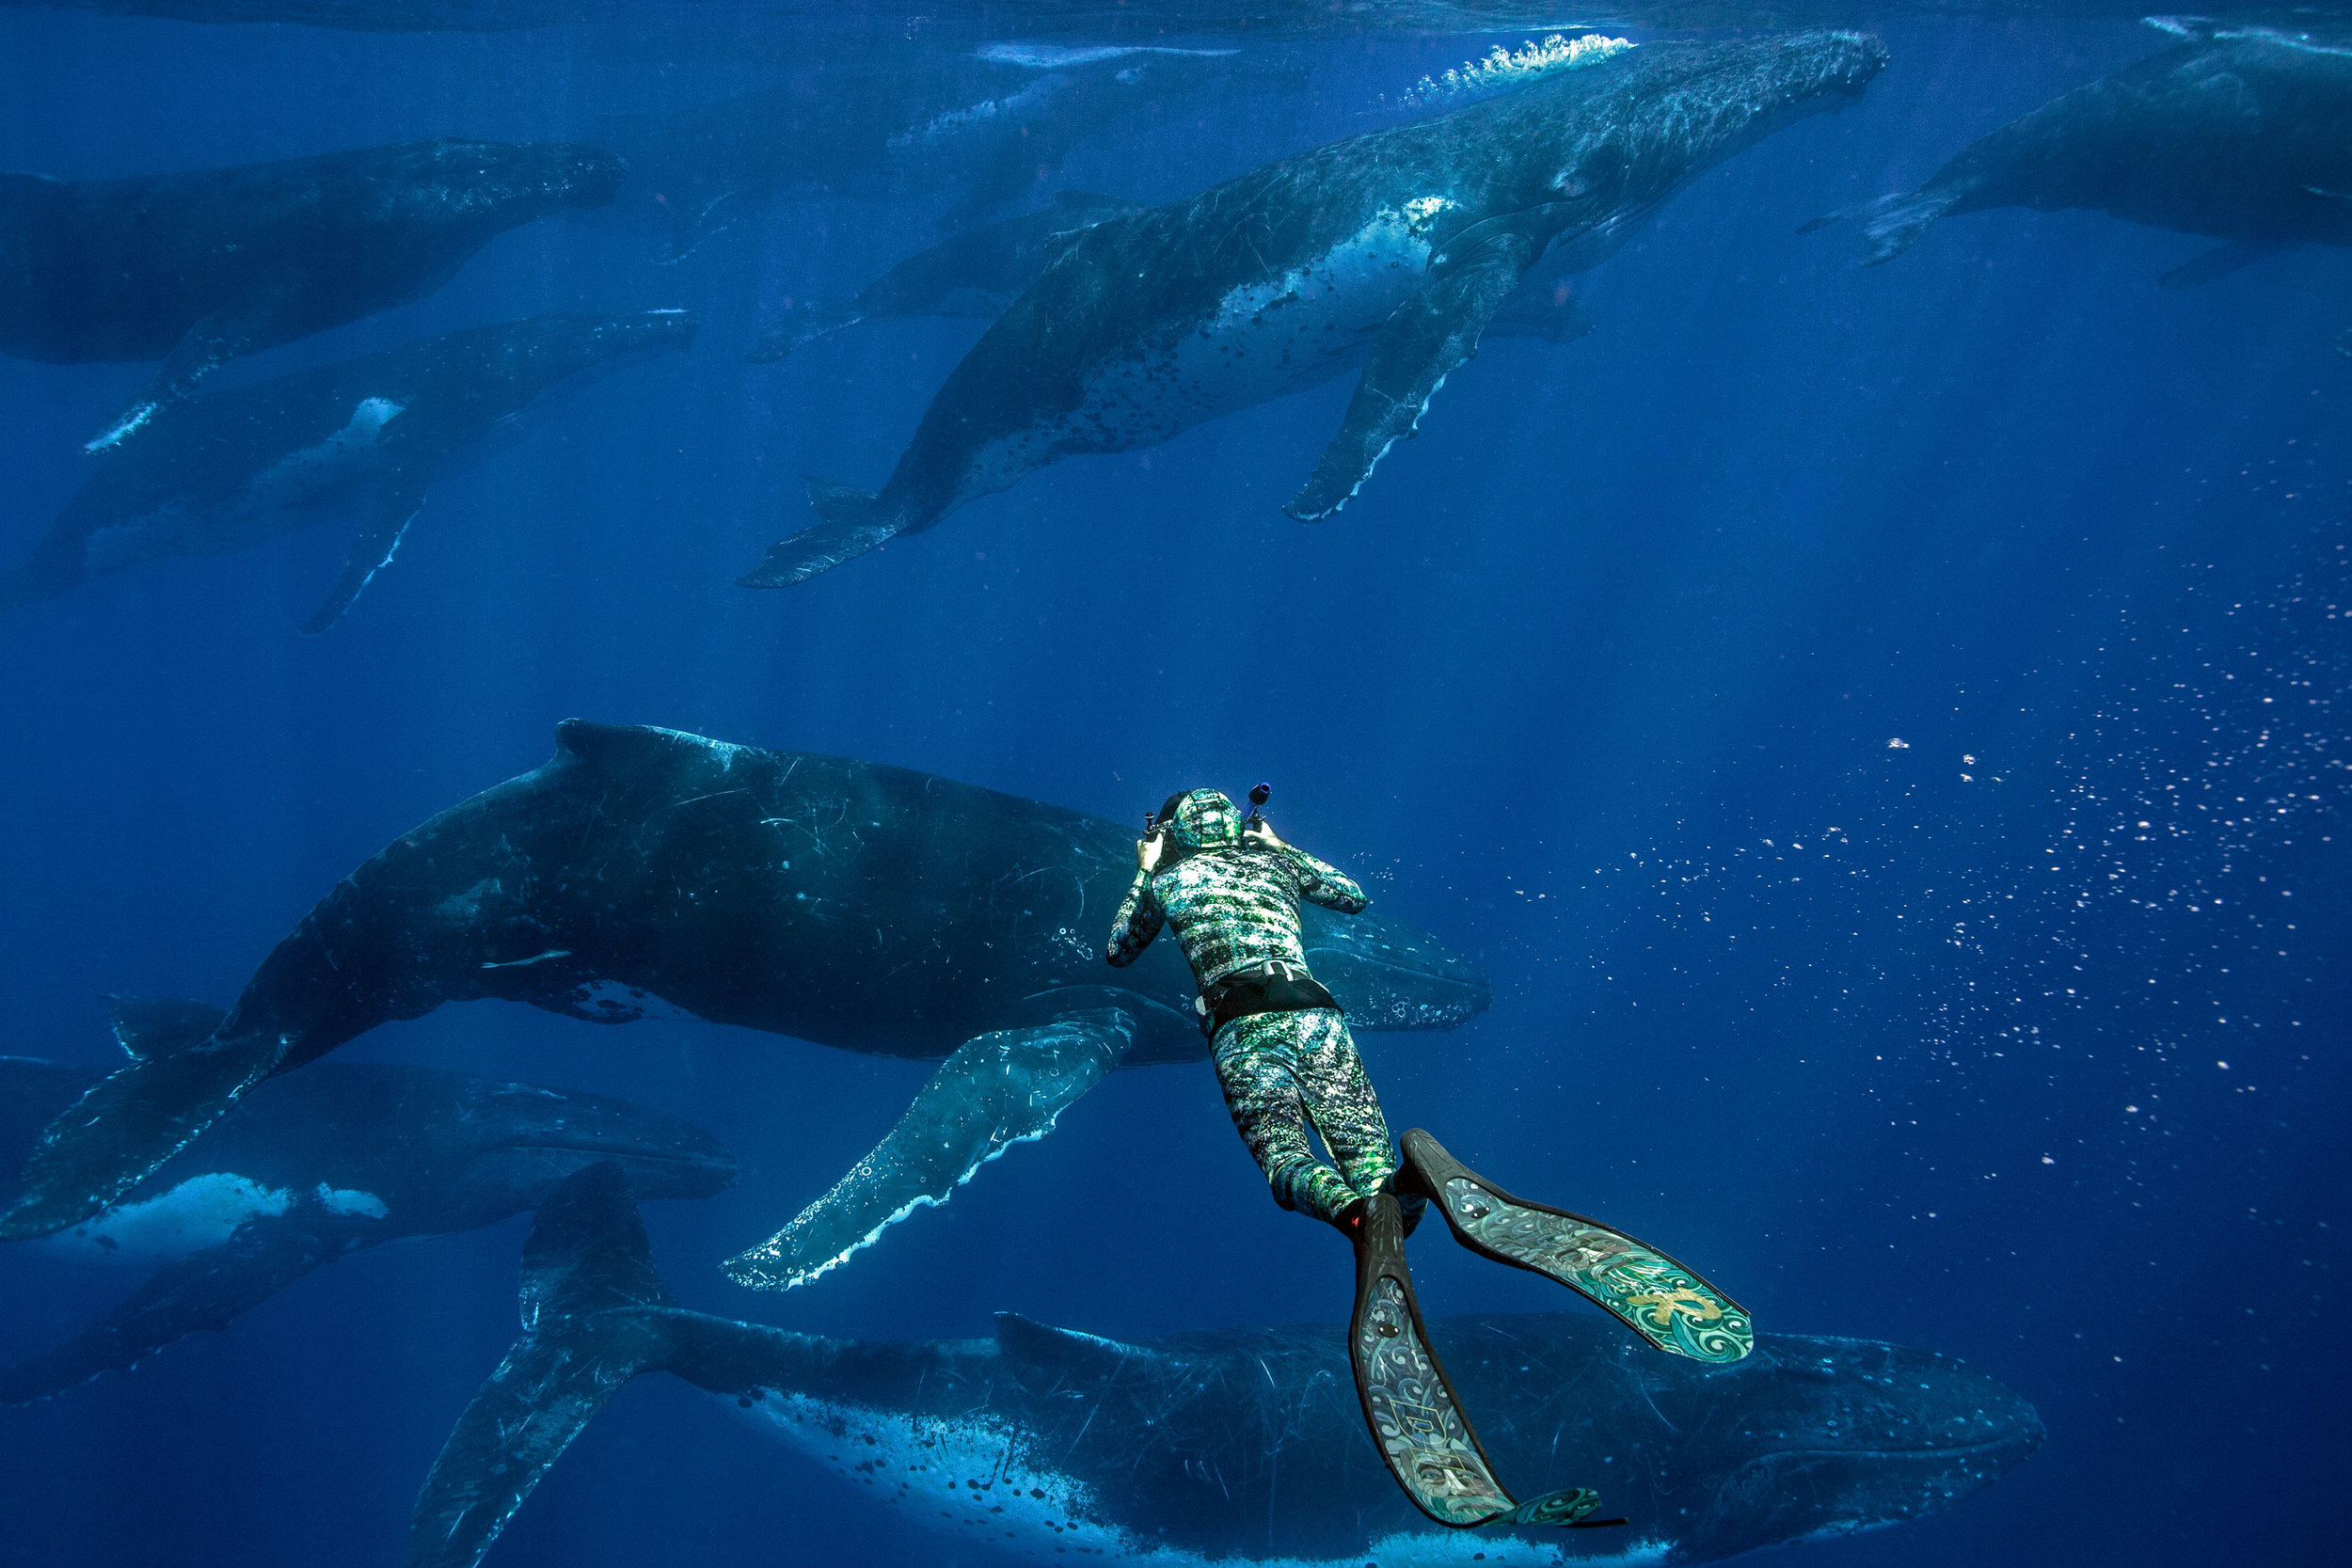 swim-with-whales-rurutu-french-polynesia-sustainable-eco-travel-inertia-network.jpg